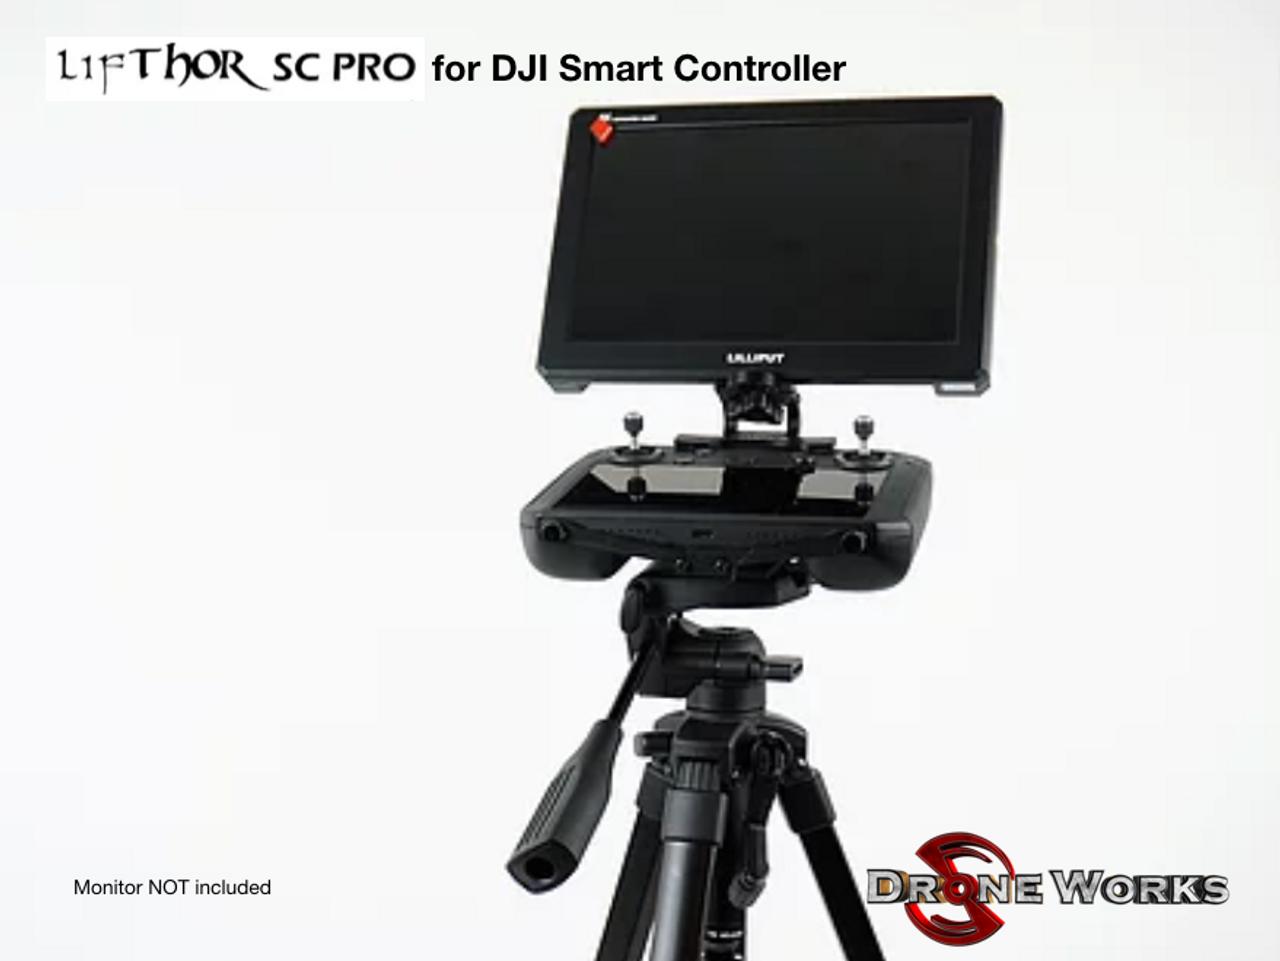 LifThor SC Pro for DJI Smart Controller